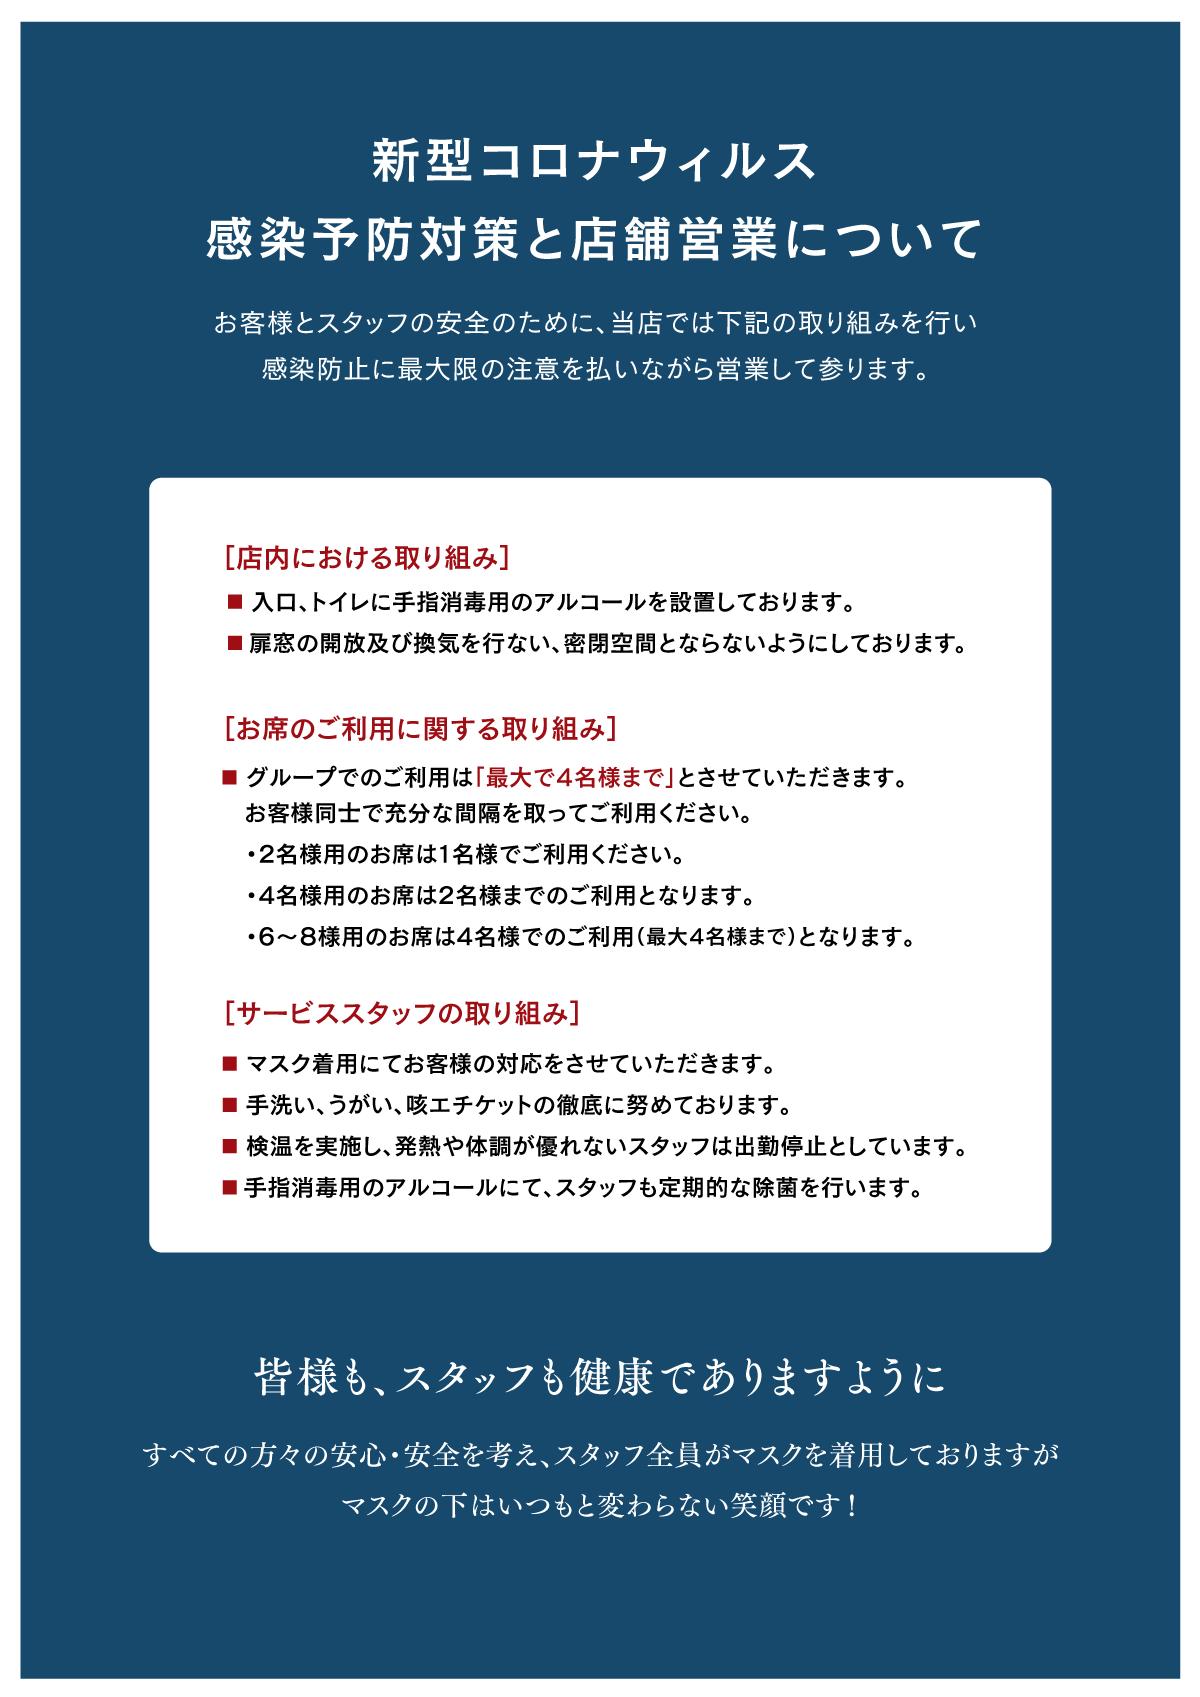 corona_info.png